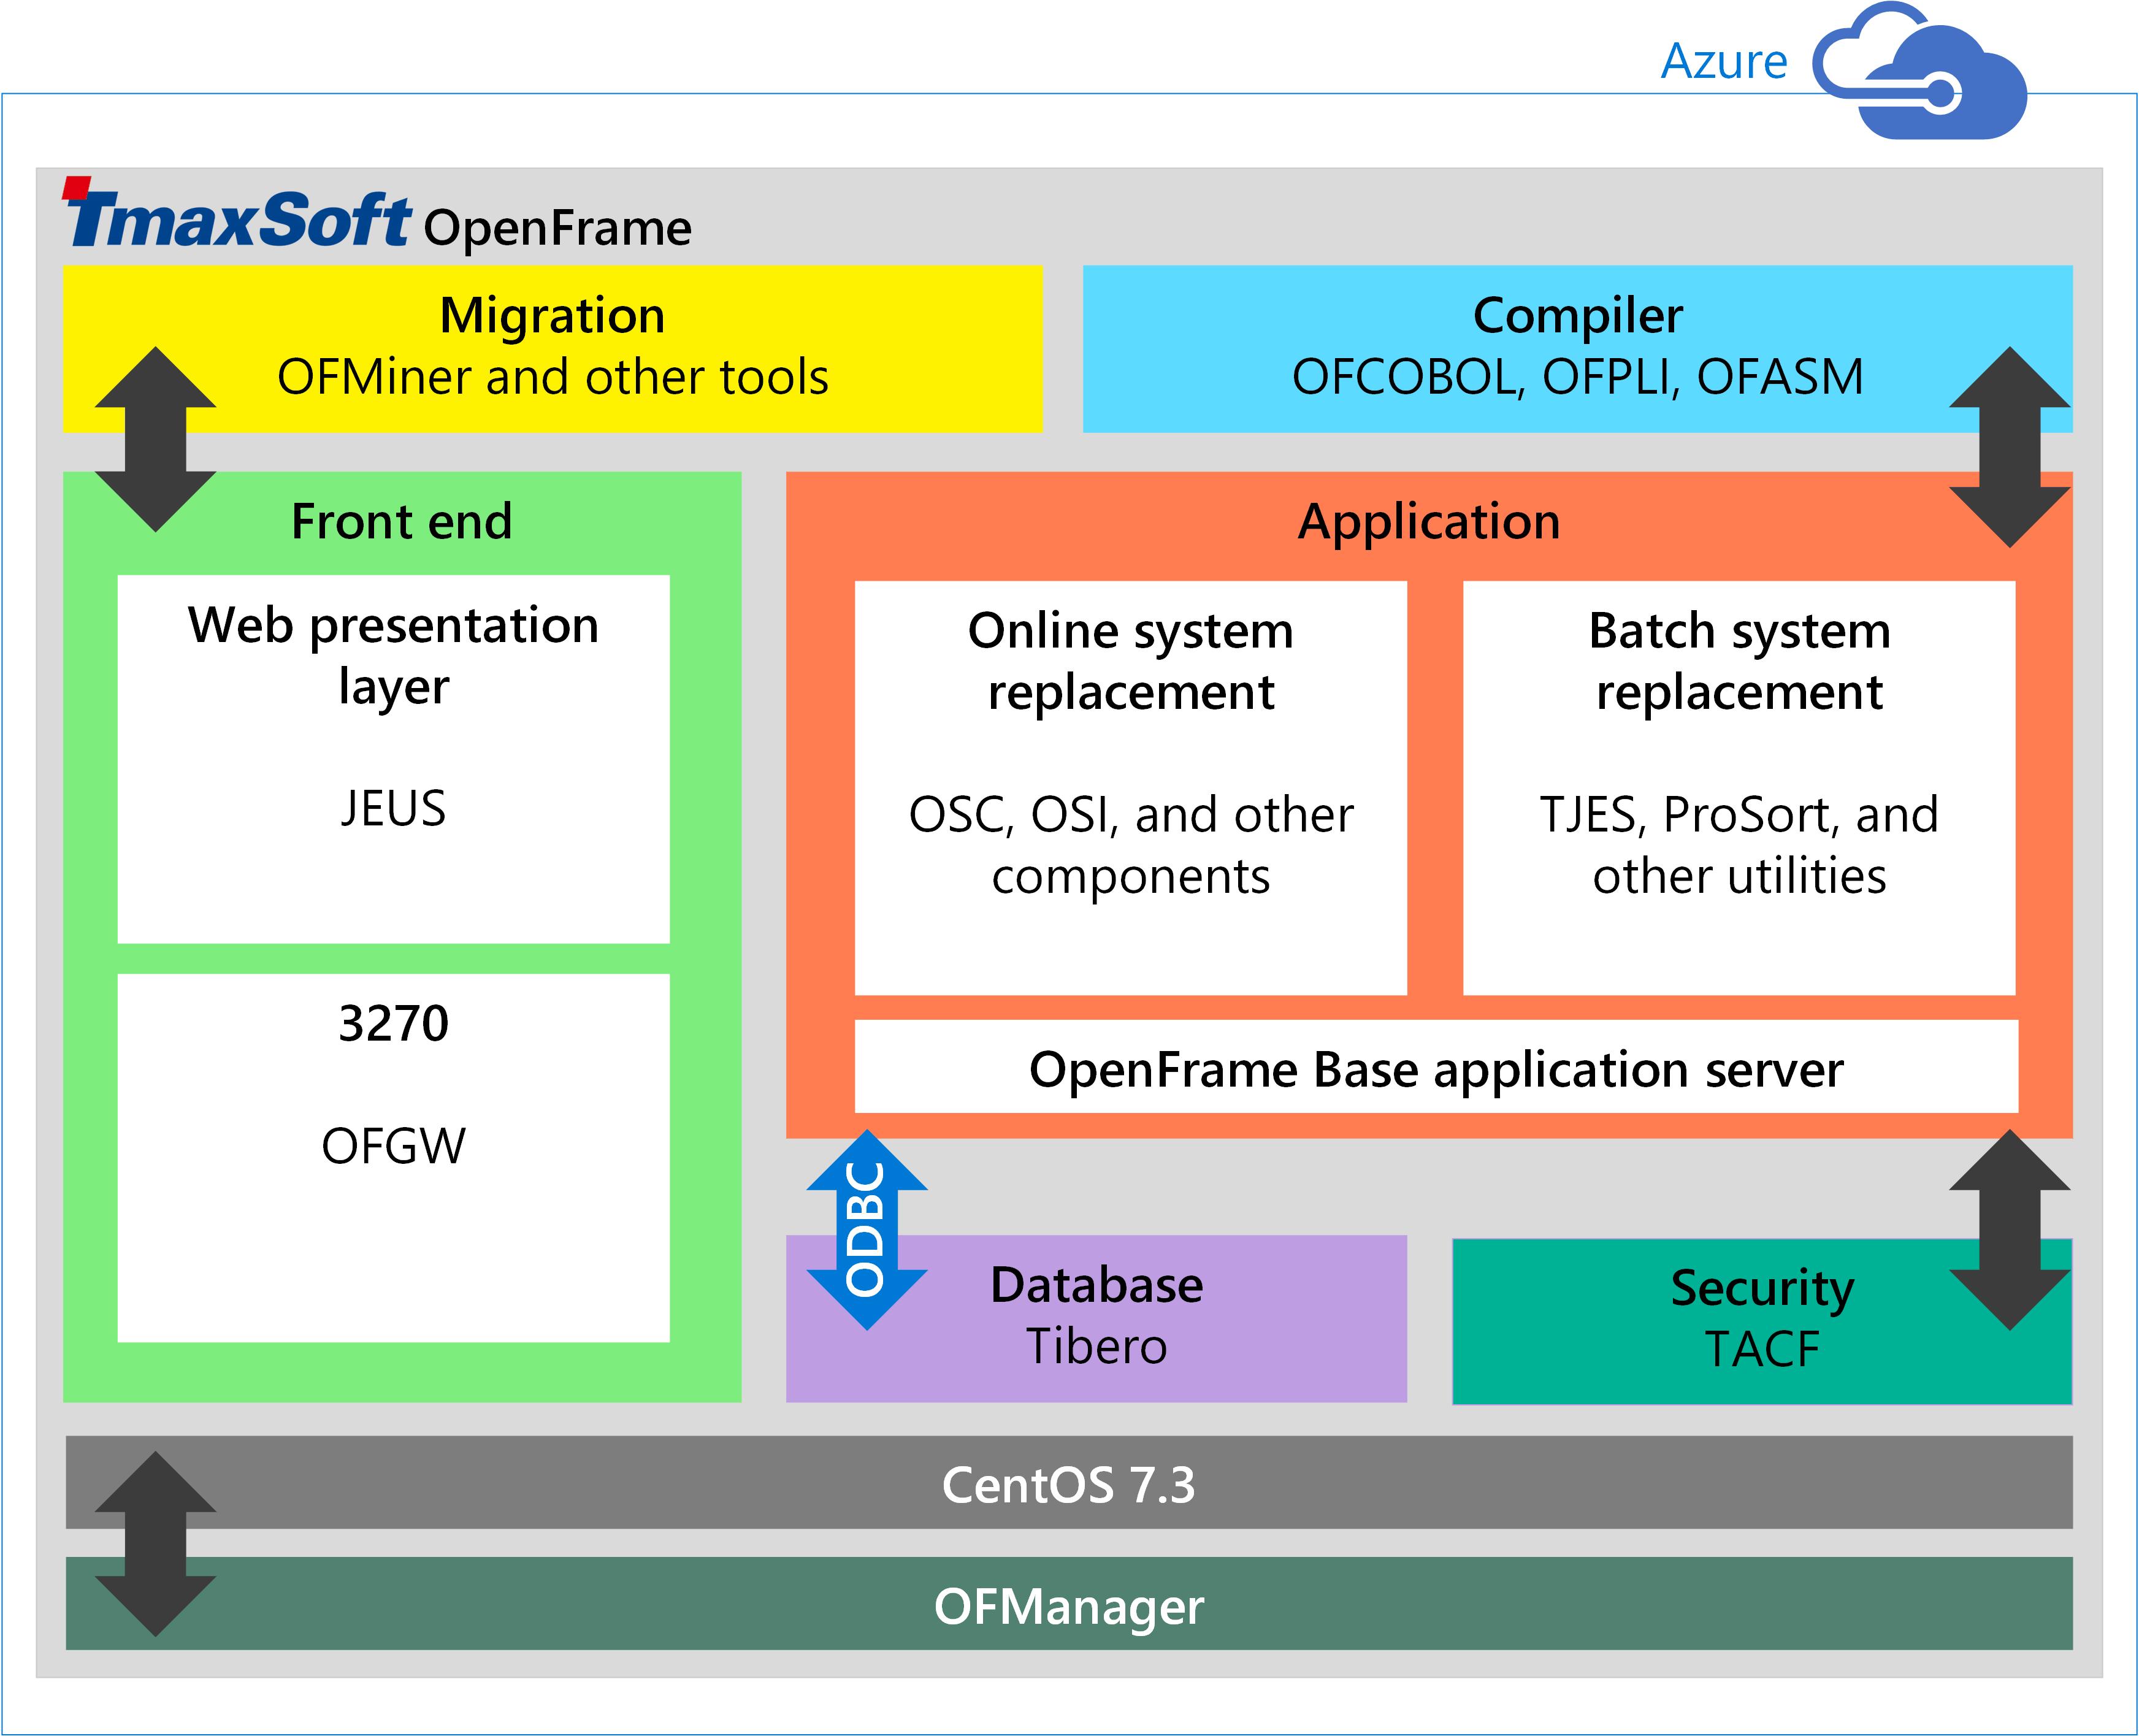 Install TmaxSoft OpenFrame on Azure Virtual Machines | Microsoft Docs